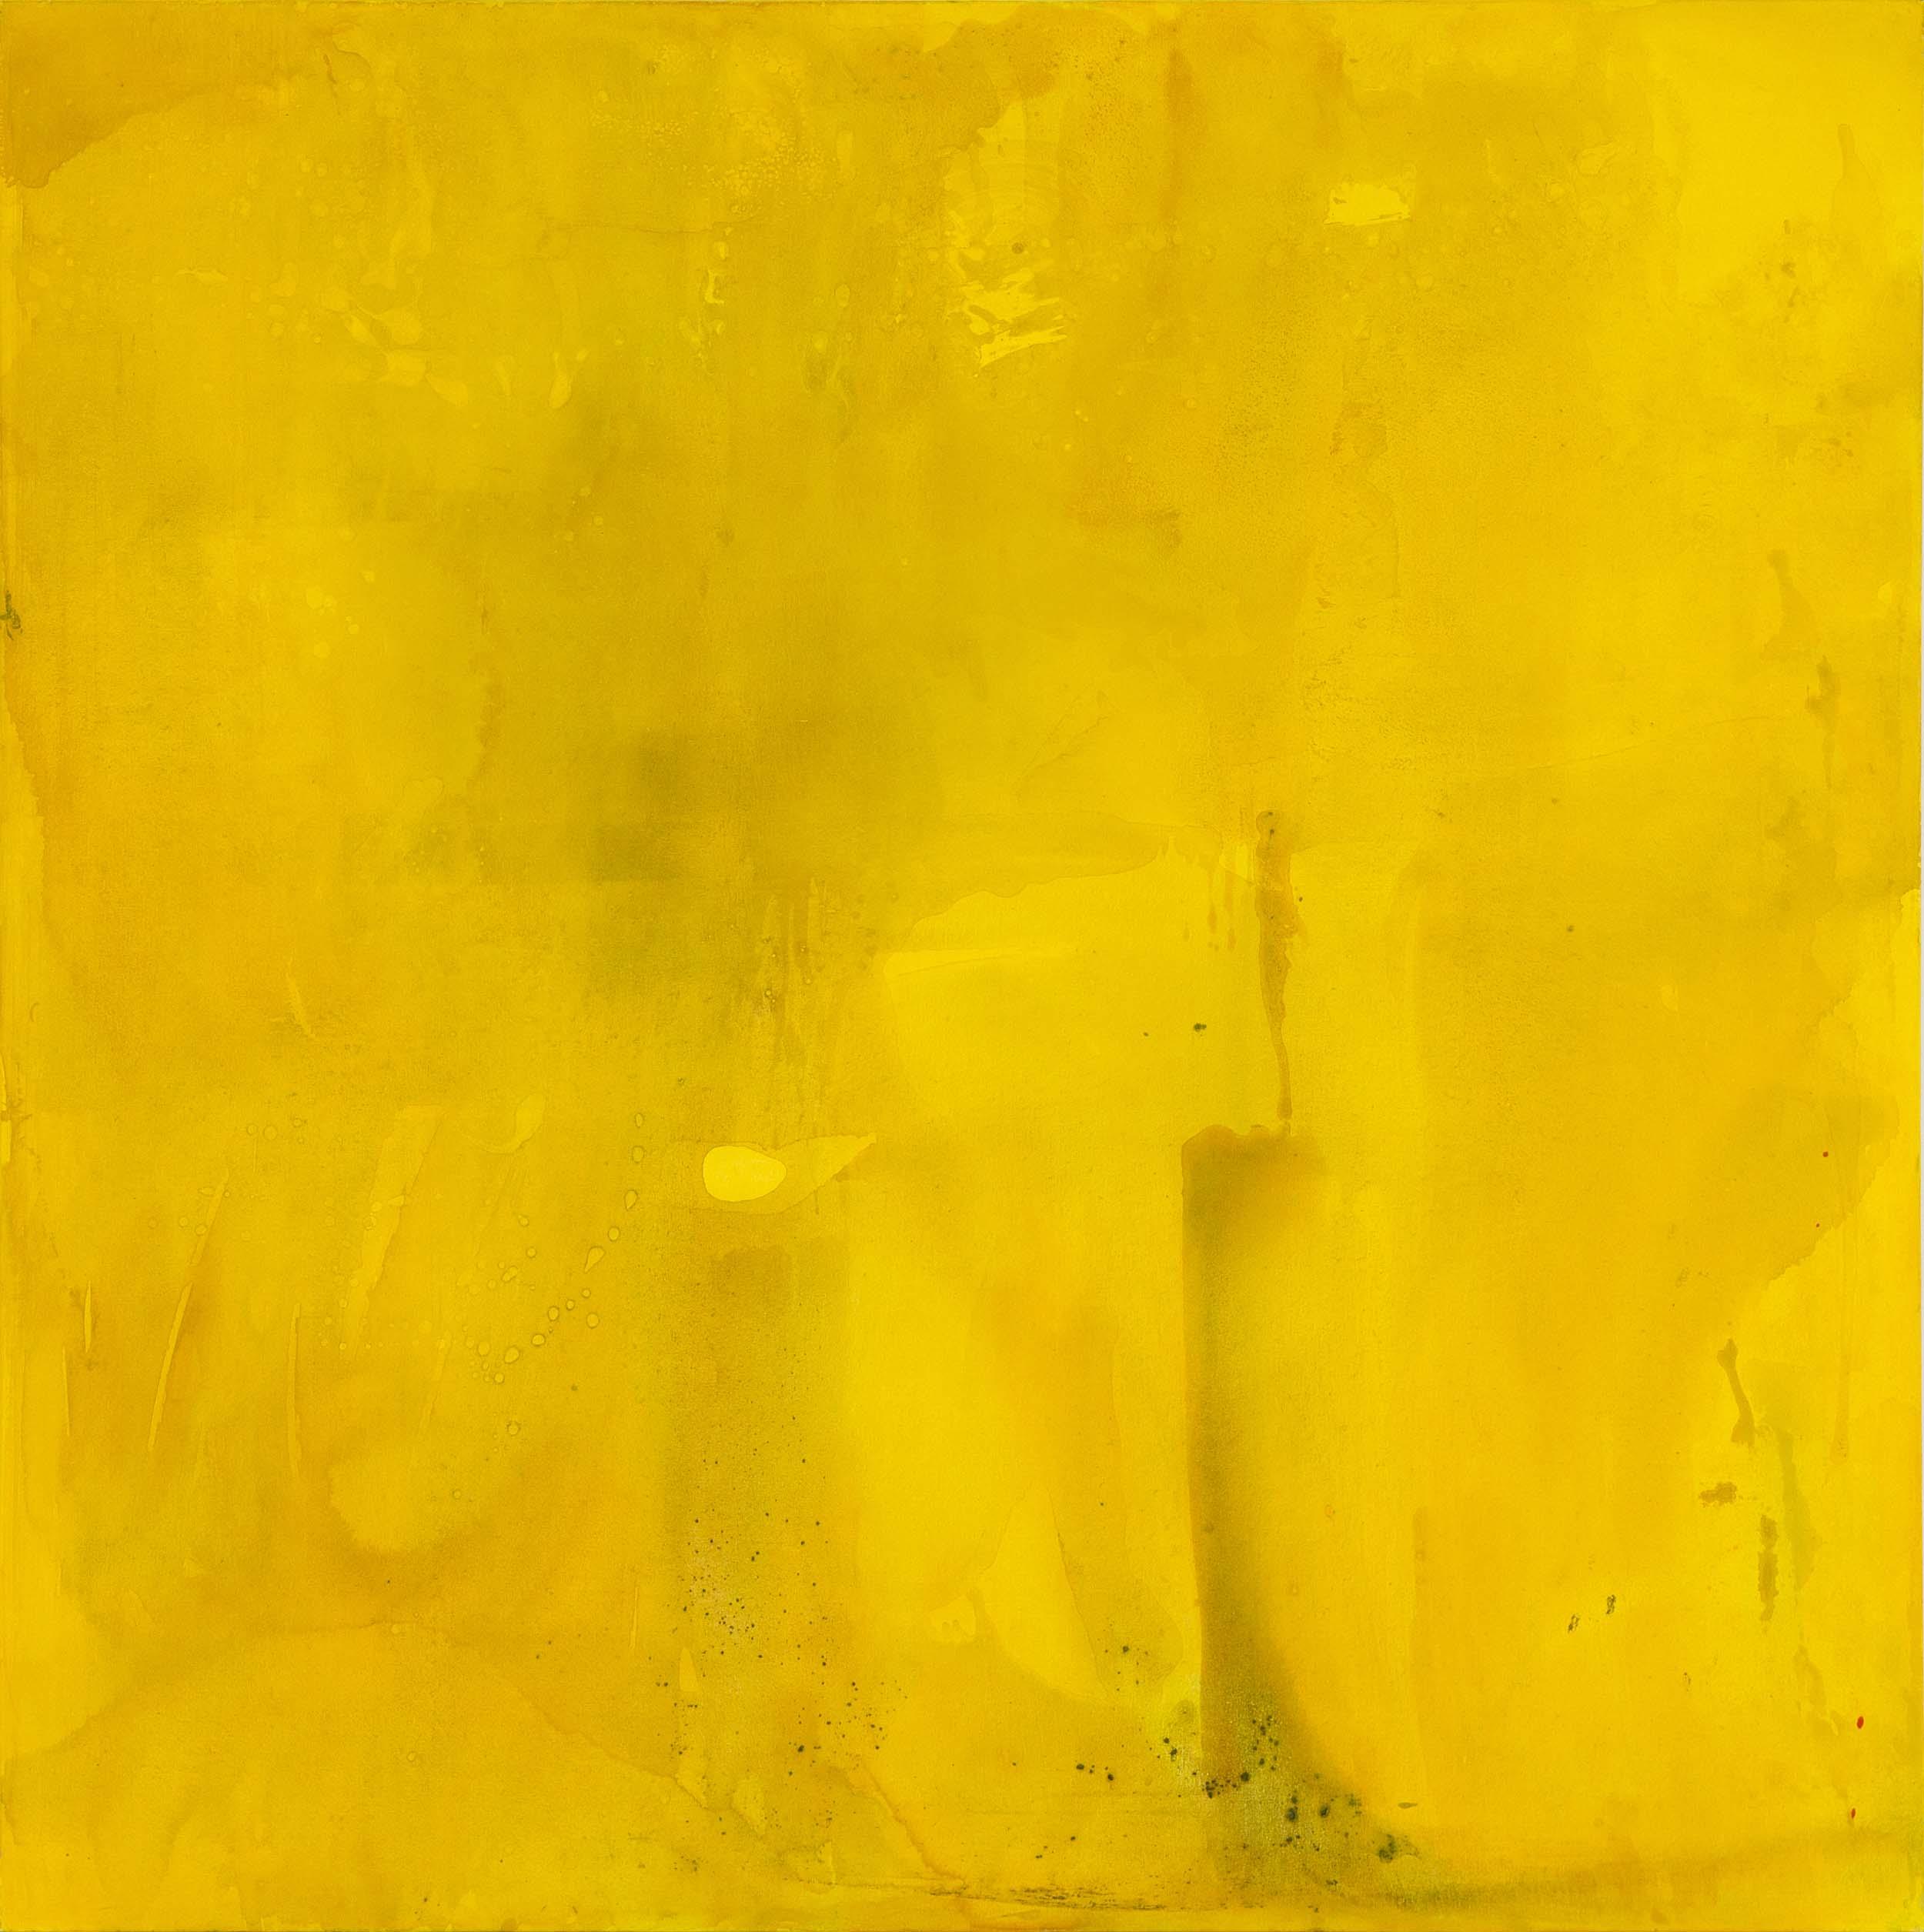 Amarillo Ocre (2014) - Ángela Wilson Searle